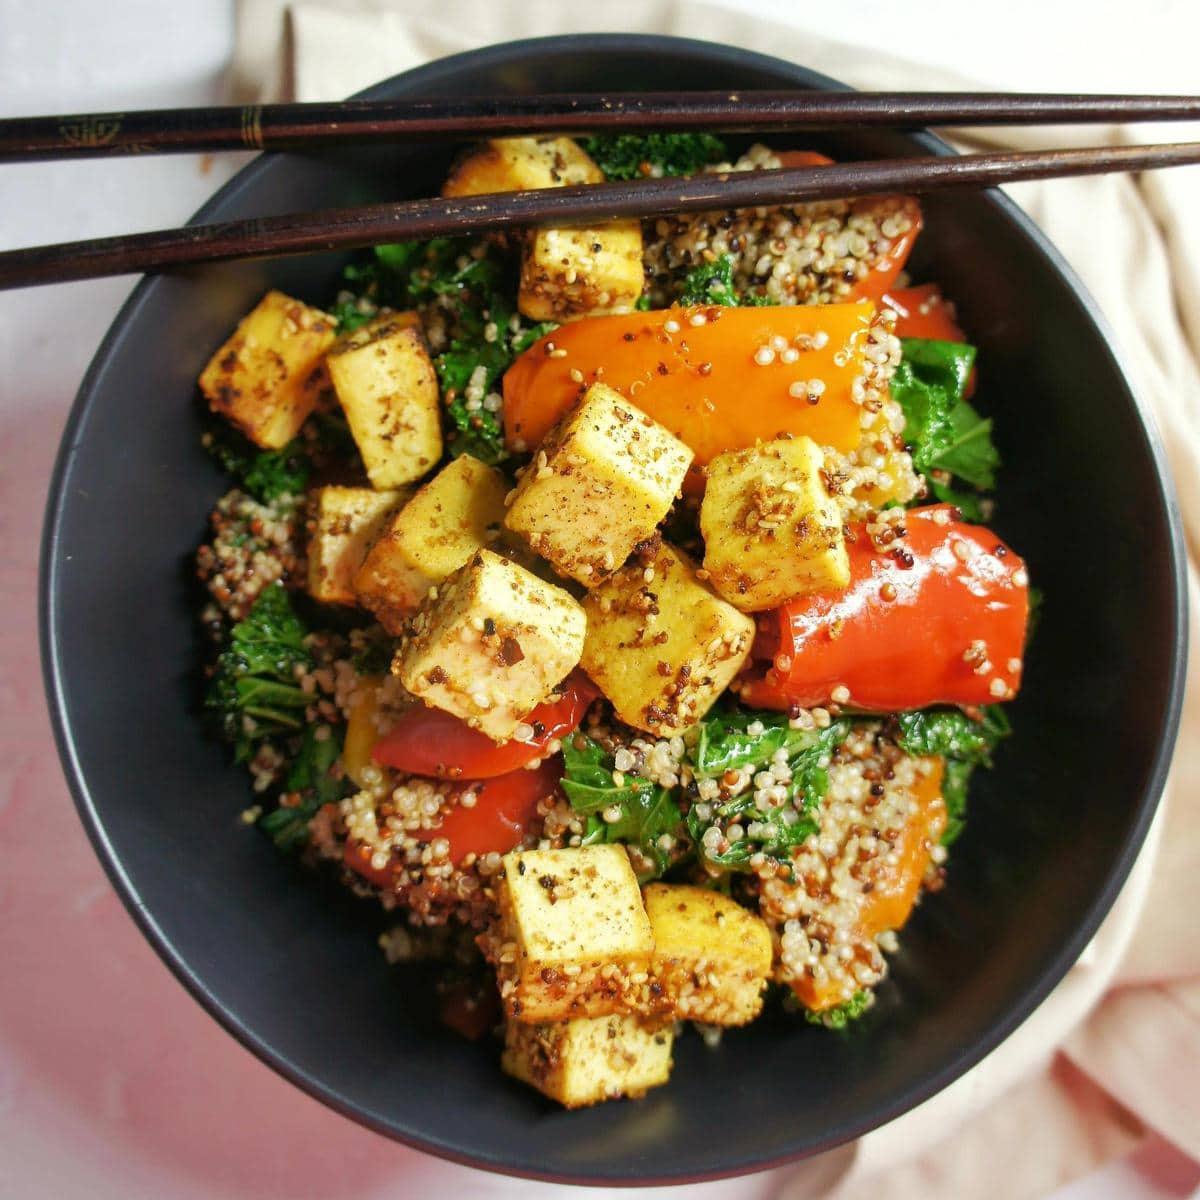 40 delicious & healthy vegan salad recipes picture of Dukkah tofu salad for recipe roundup